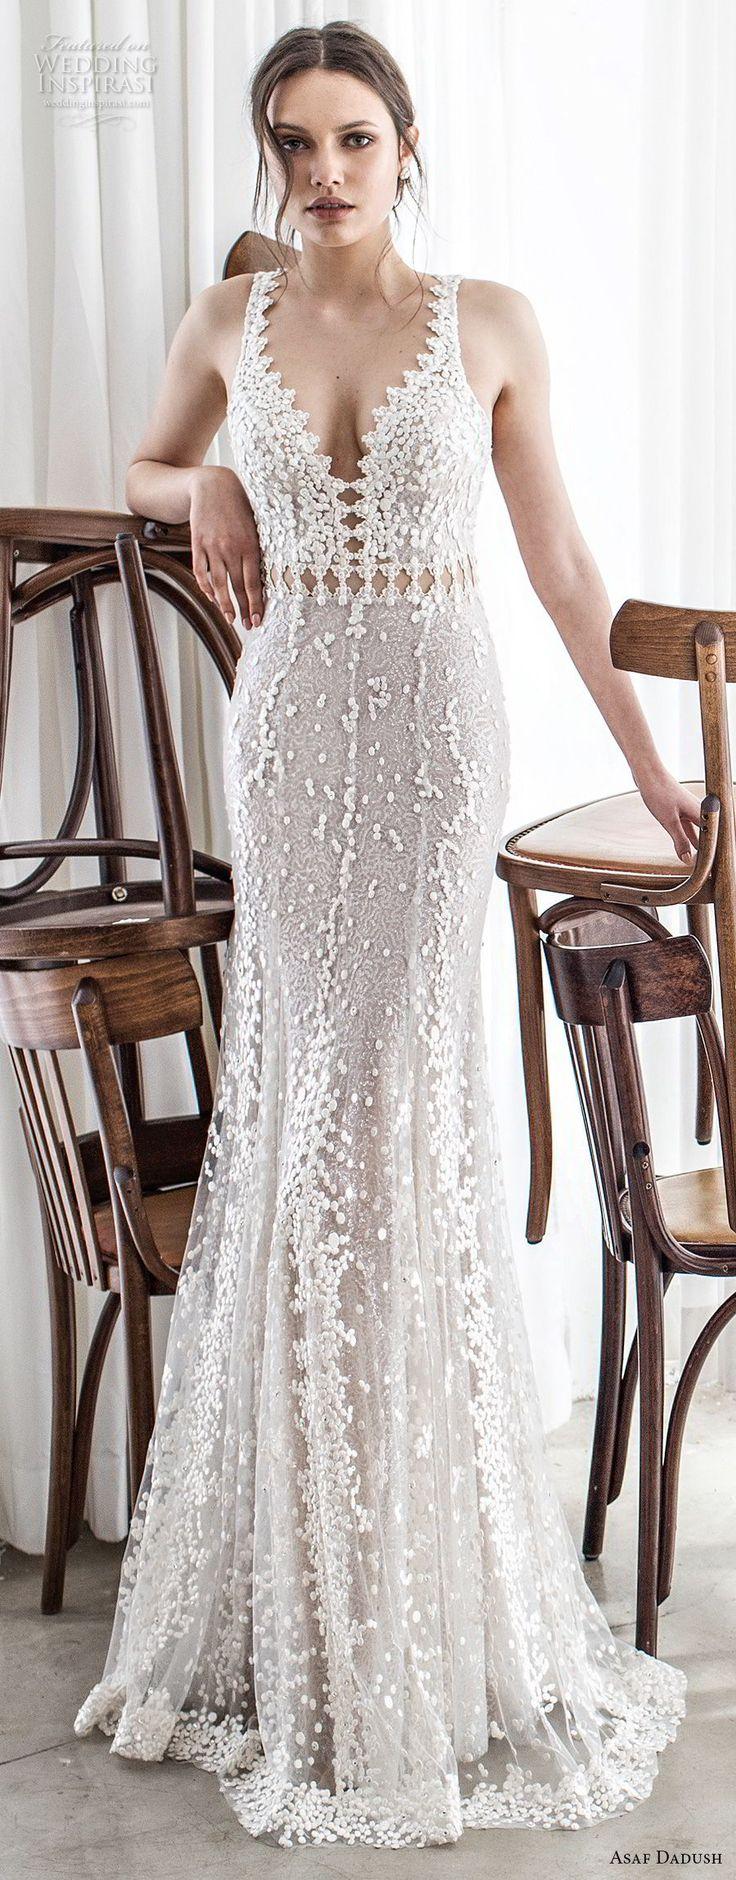 asaf dadush 2017 bridal sleeveless embroidered strap v neck full embellishment elegant glamorous fit and flare sheath wedding dress open back sweep train (01) lv